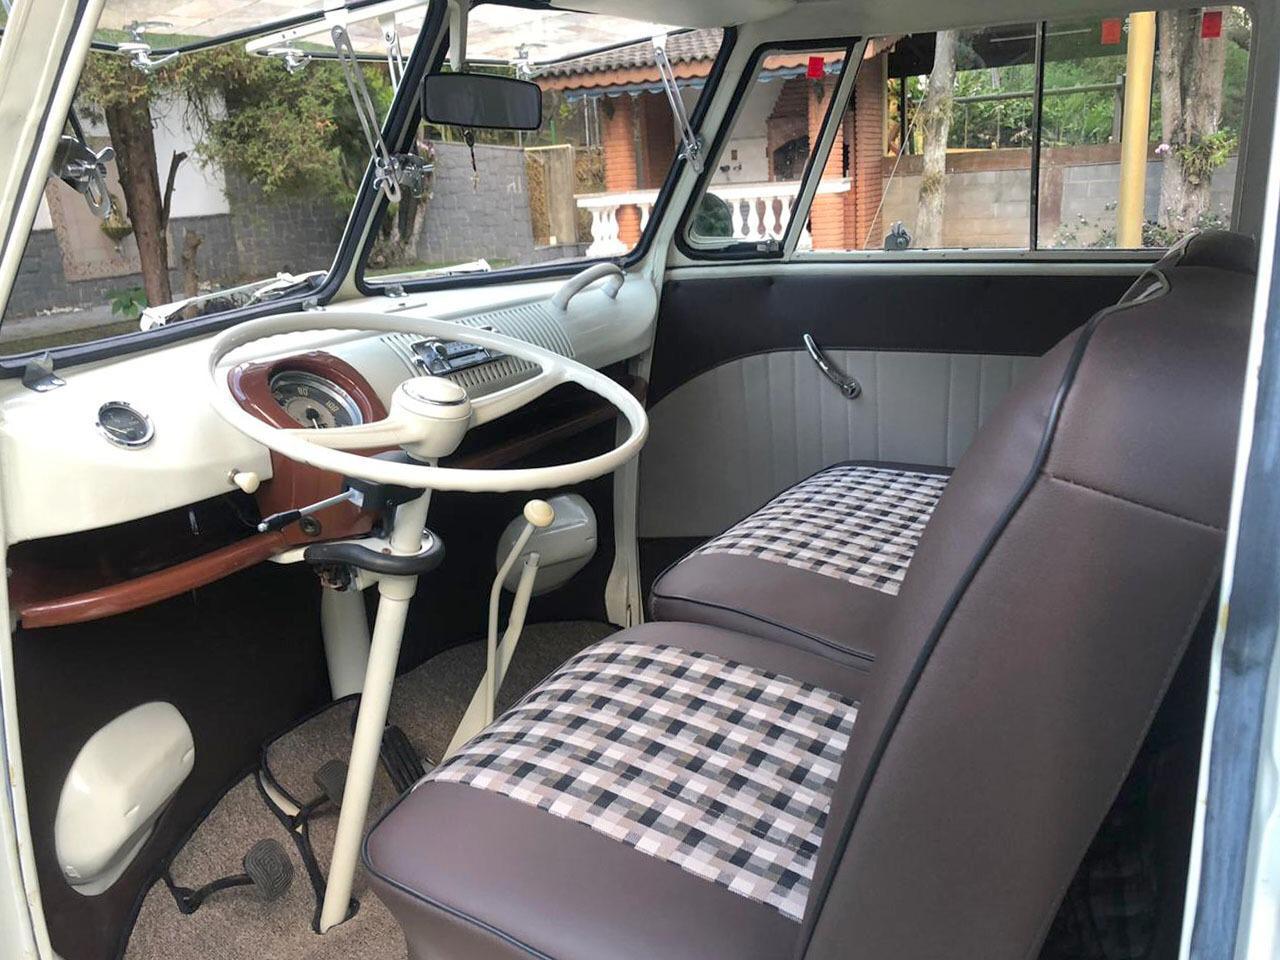 Classic Volkswagen T1 Bus steering wheel |Maya |The Car'tell Members Only